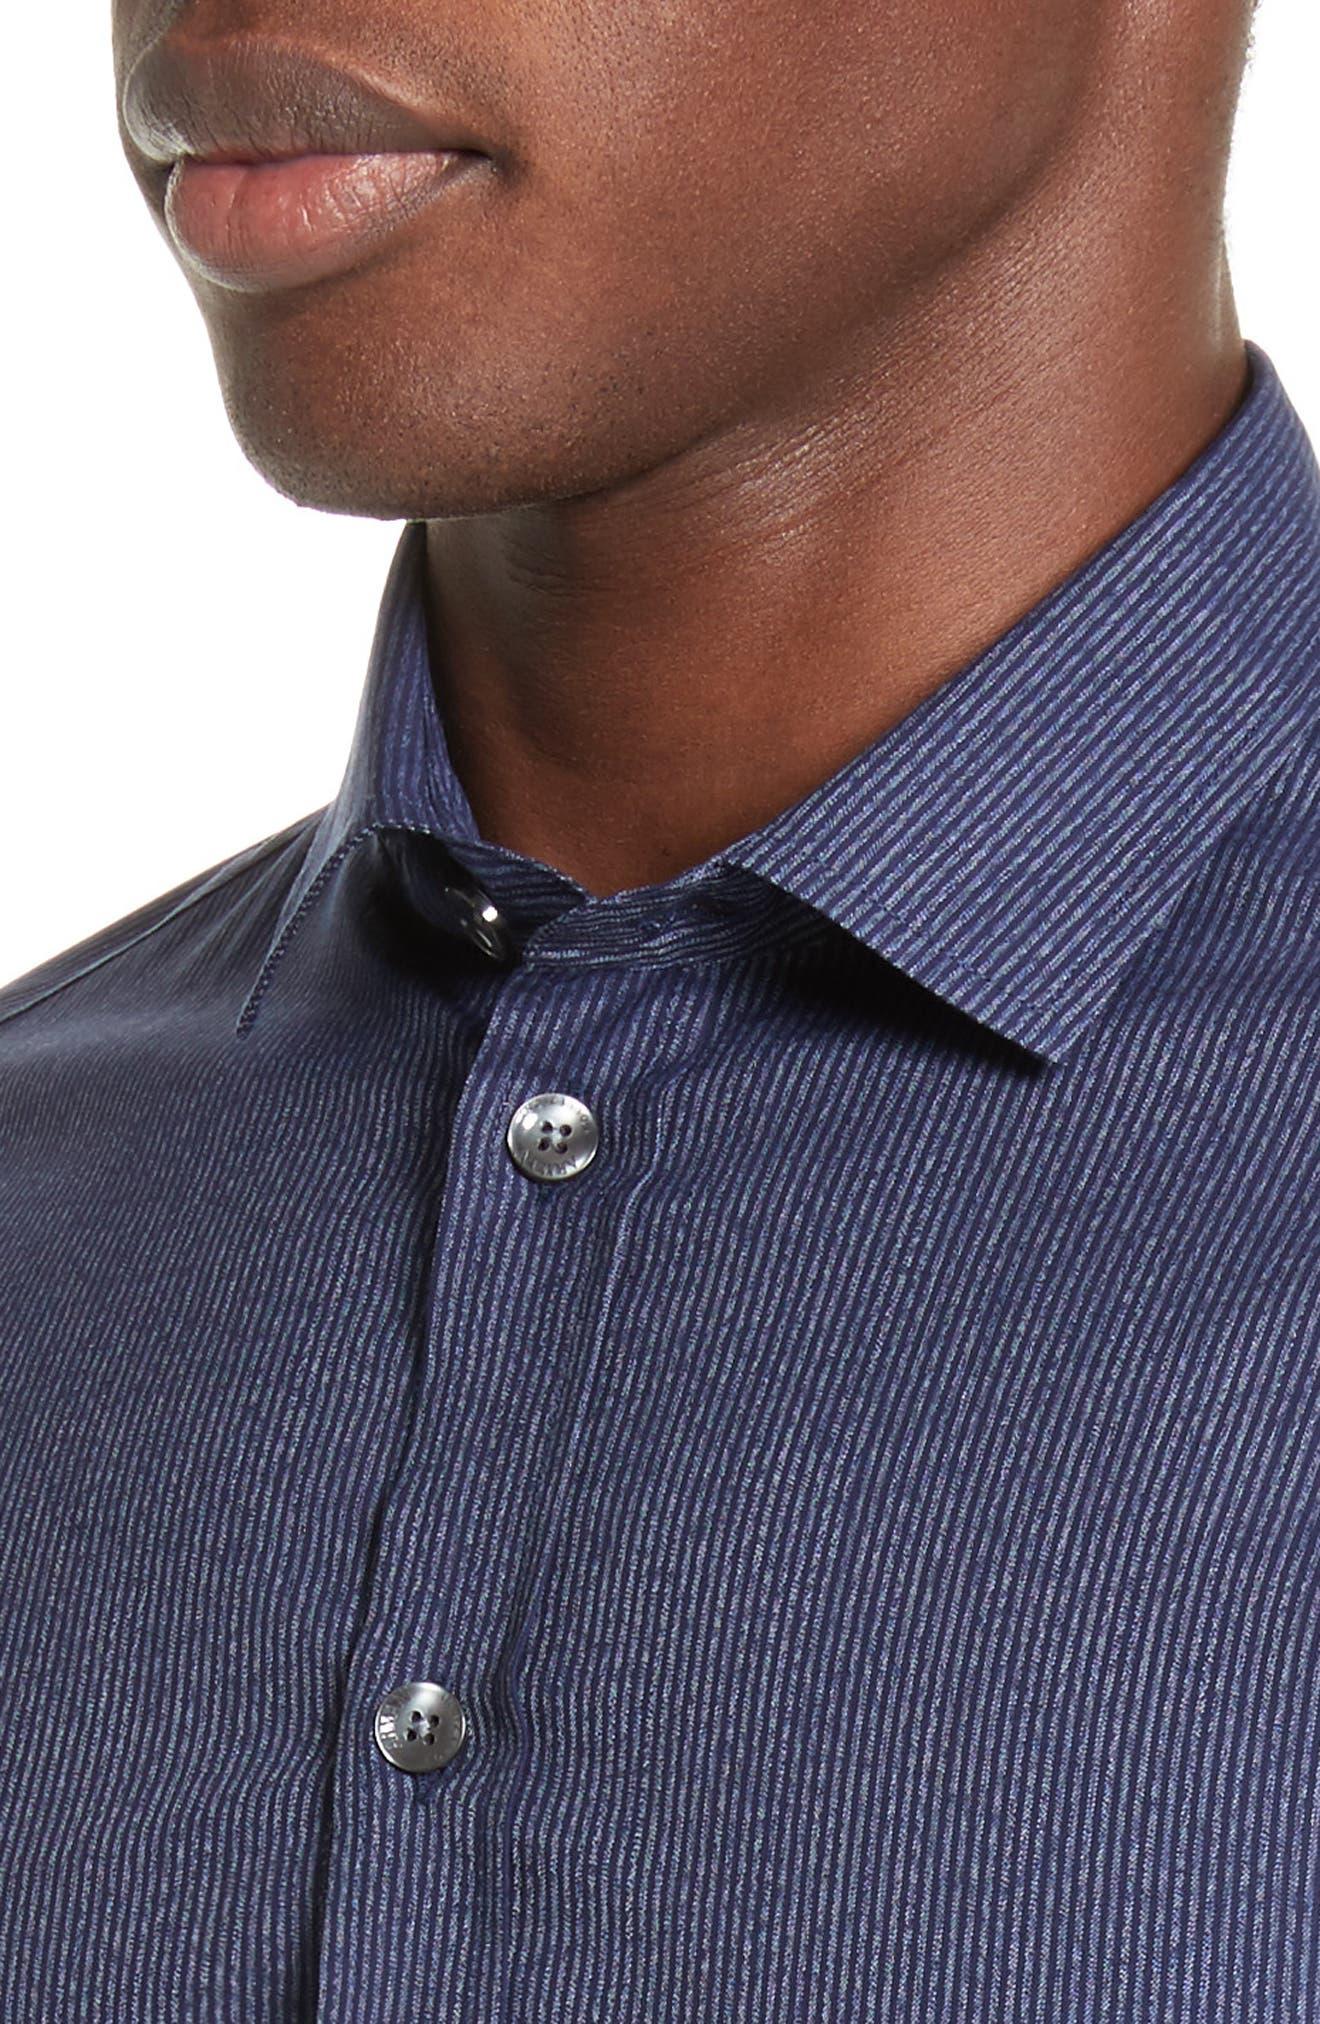 Regular Fit Pinstripe Sport Shirt,                             Alternate thumbnail 2, color,                             Striped Blue